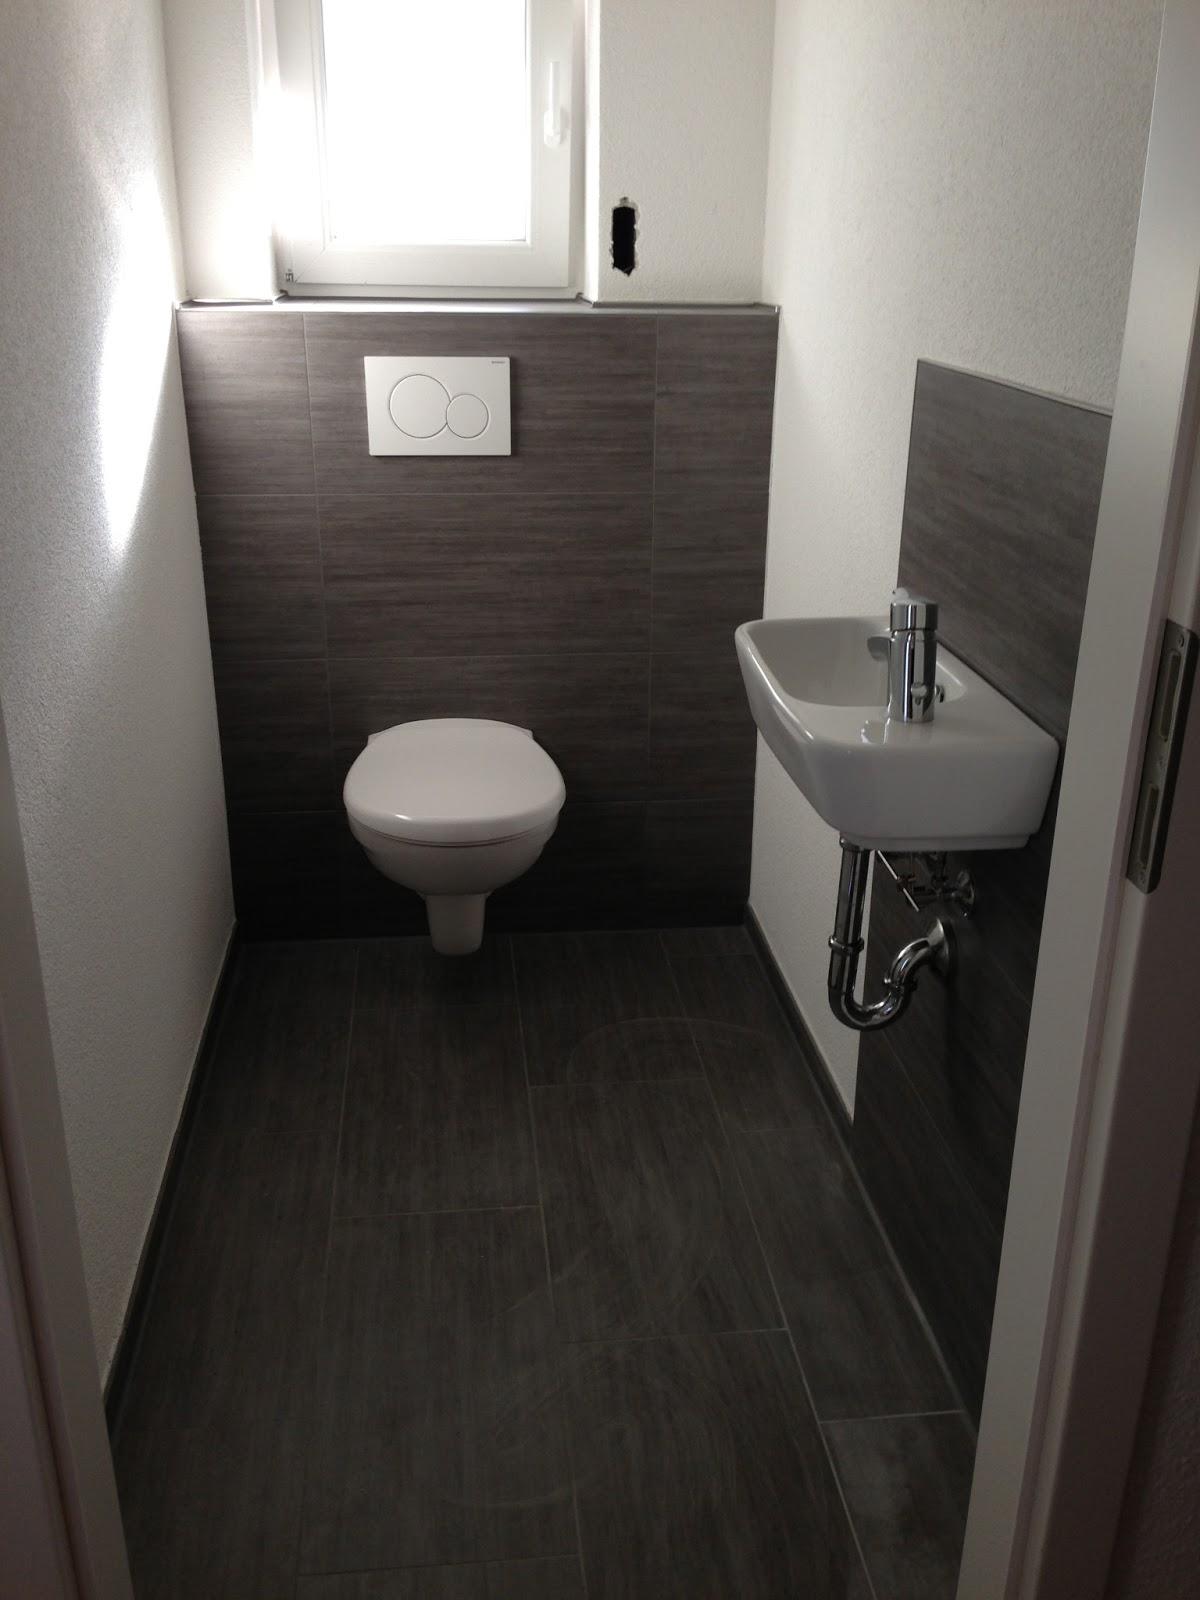 Badezimmer 5 Qm